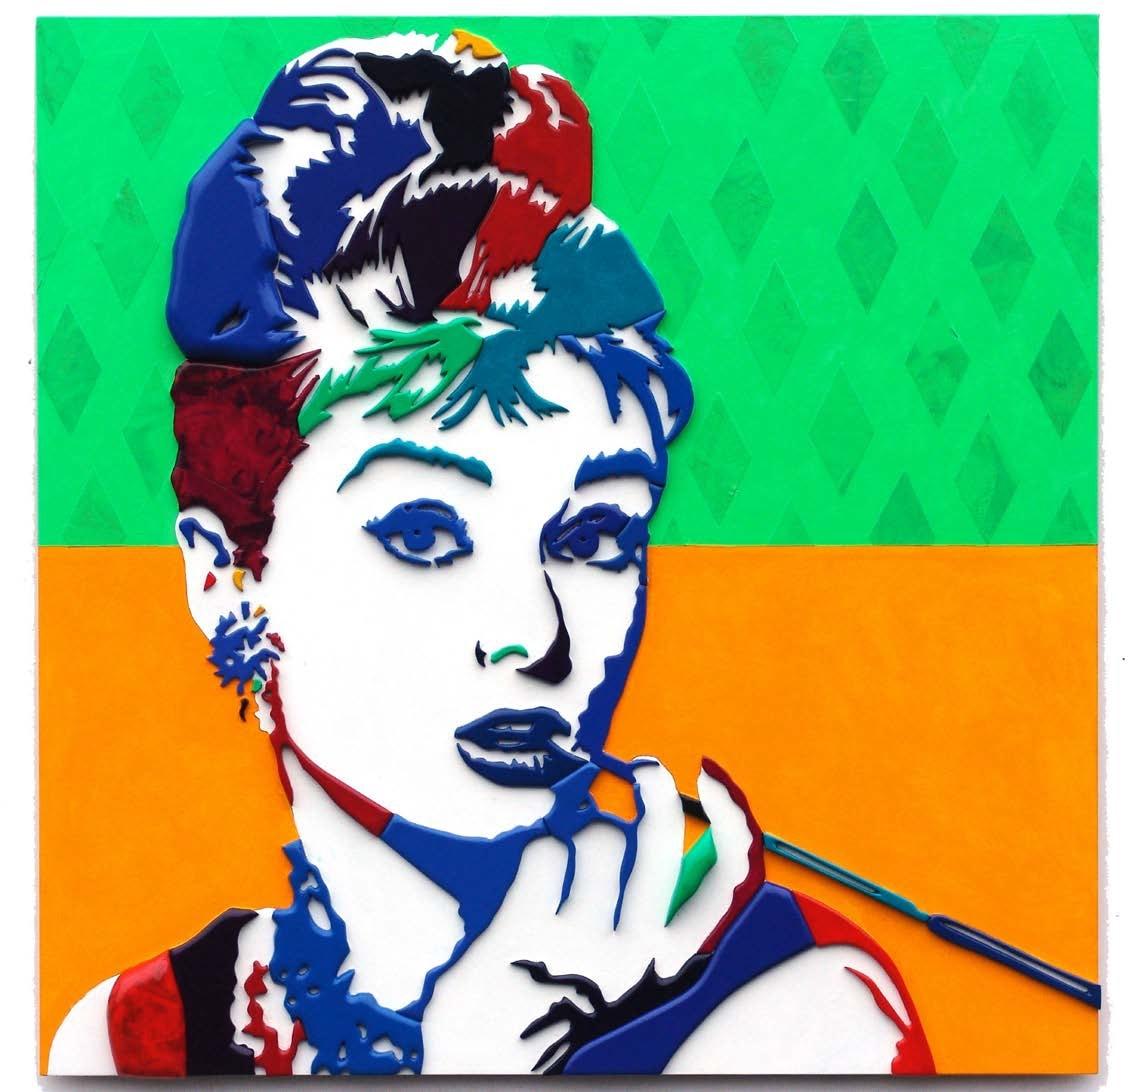 Brevi Audrey Hepburn 2011